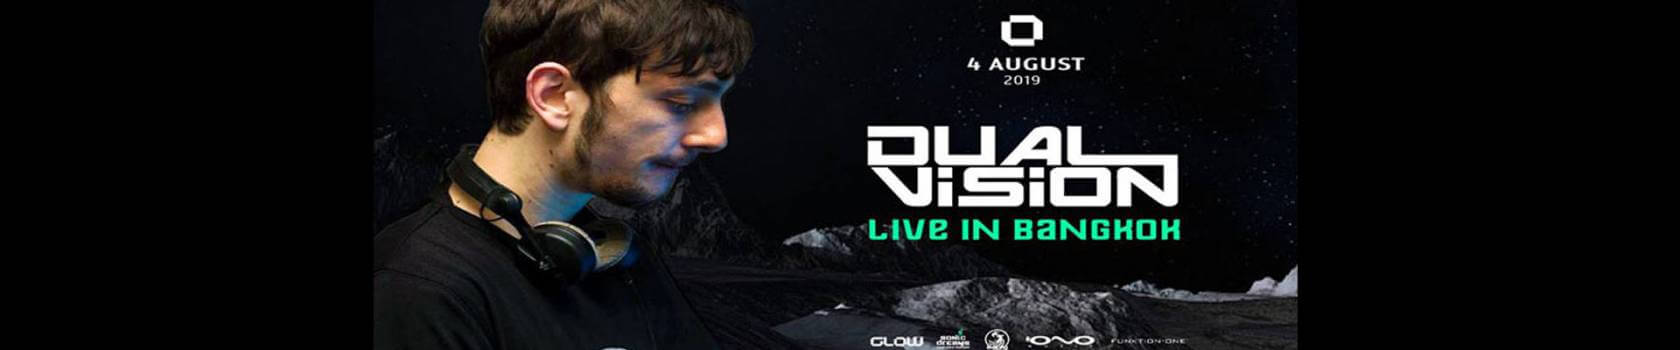 Dual Vision Live in Bangkok